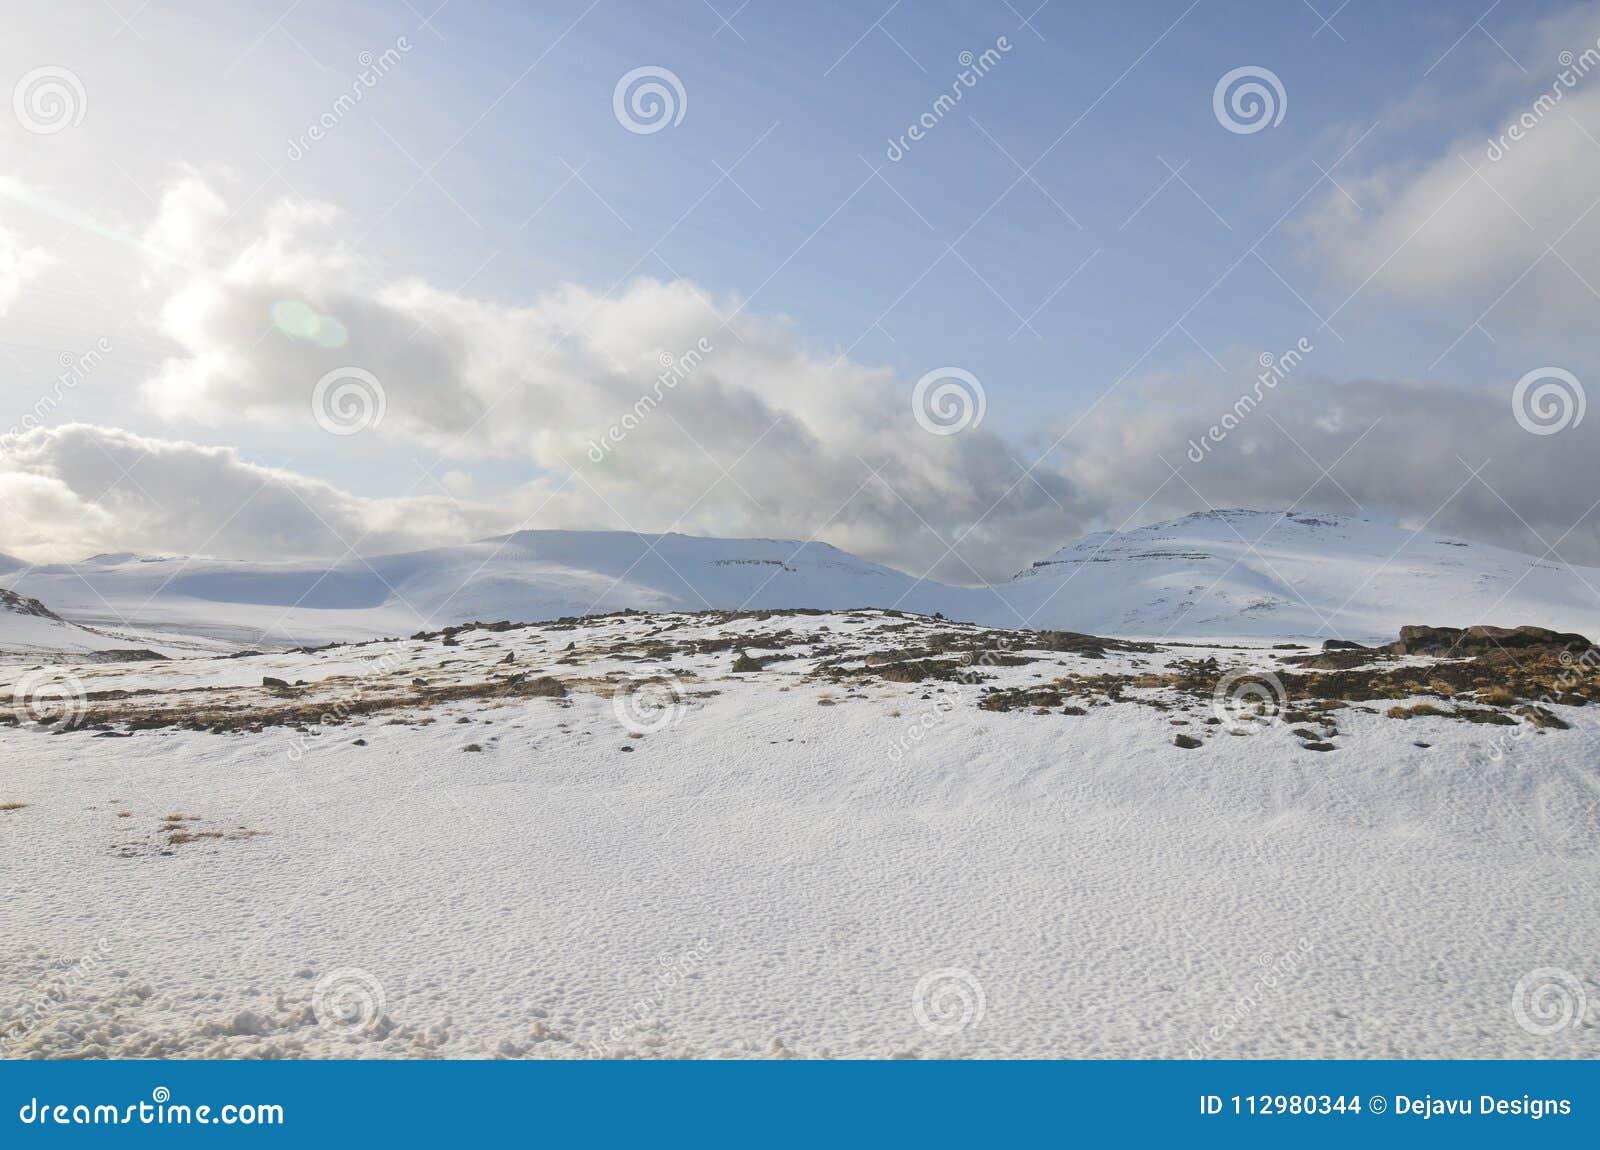 Snaefellsjokull Glacier on a Beautiful Summer Day